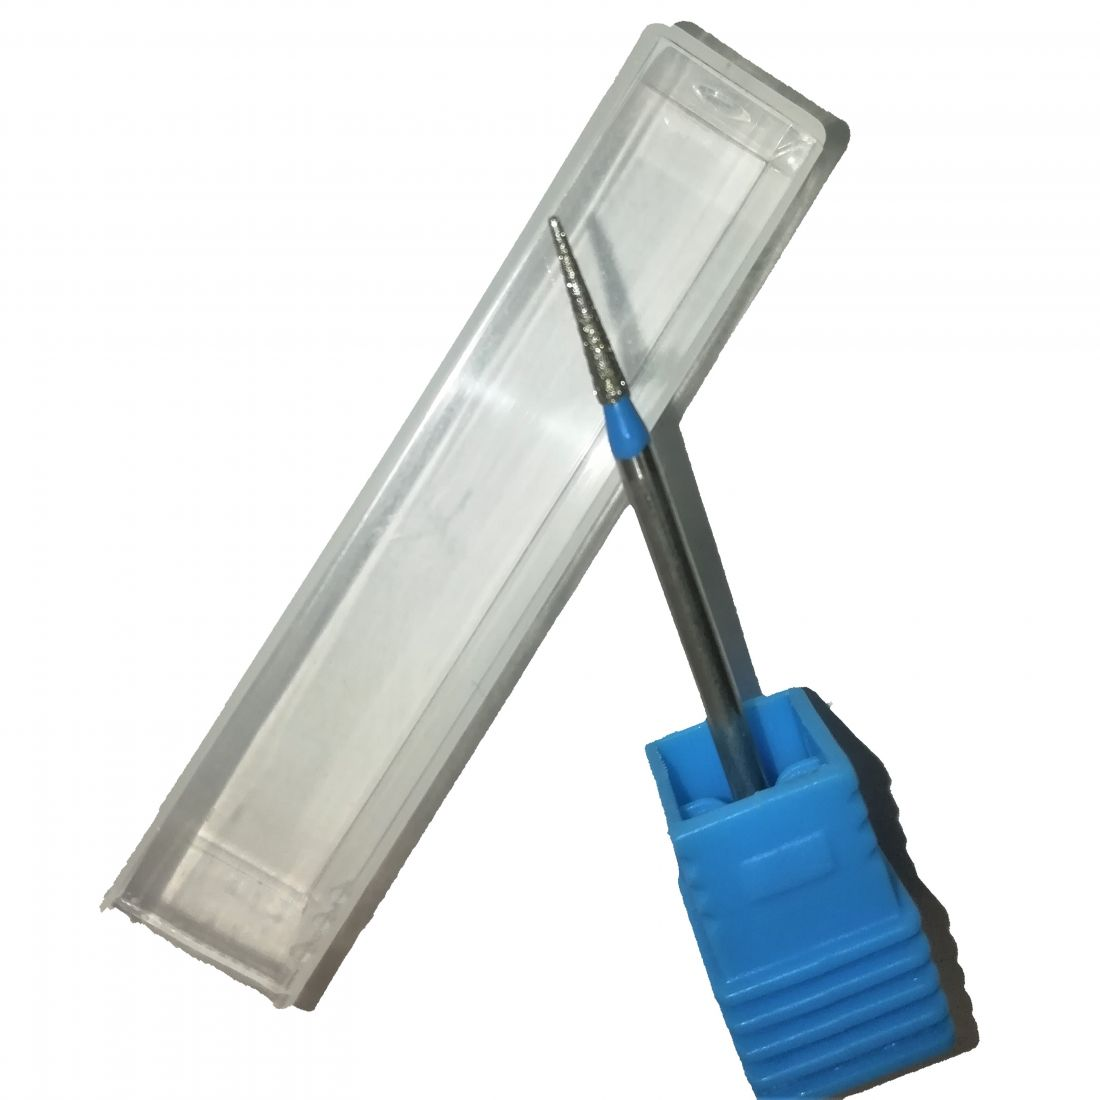 Алмазная фреза игла синяя  (2 мм) Арт. 73